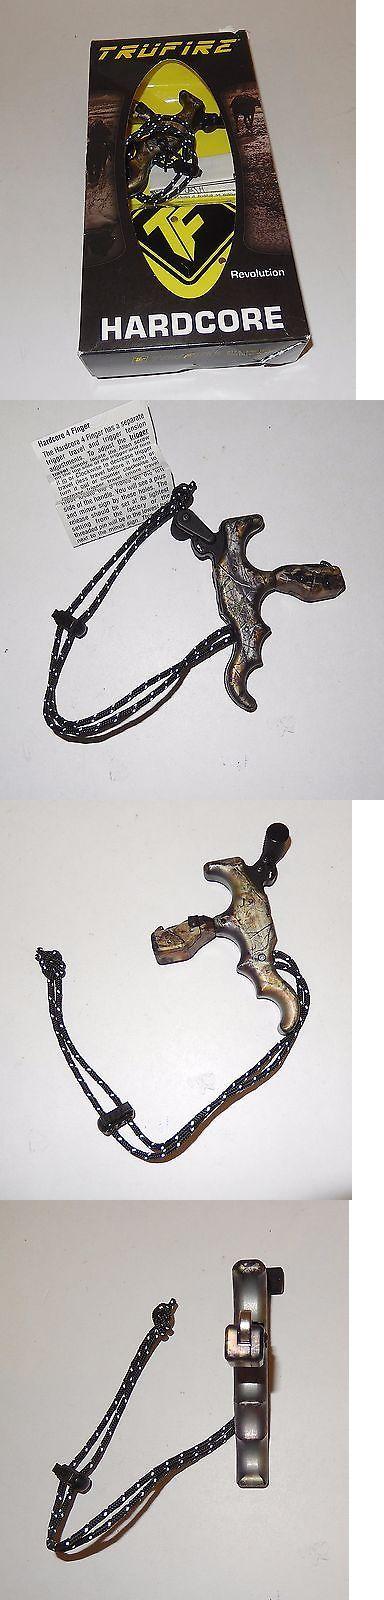 Other Archery Accessories 181306: Tru-Fire Hardcore 4 Finger Revolution Archery Release, Camo -> BUY IT NOW ONLY: $104.99 on eBay!